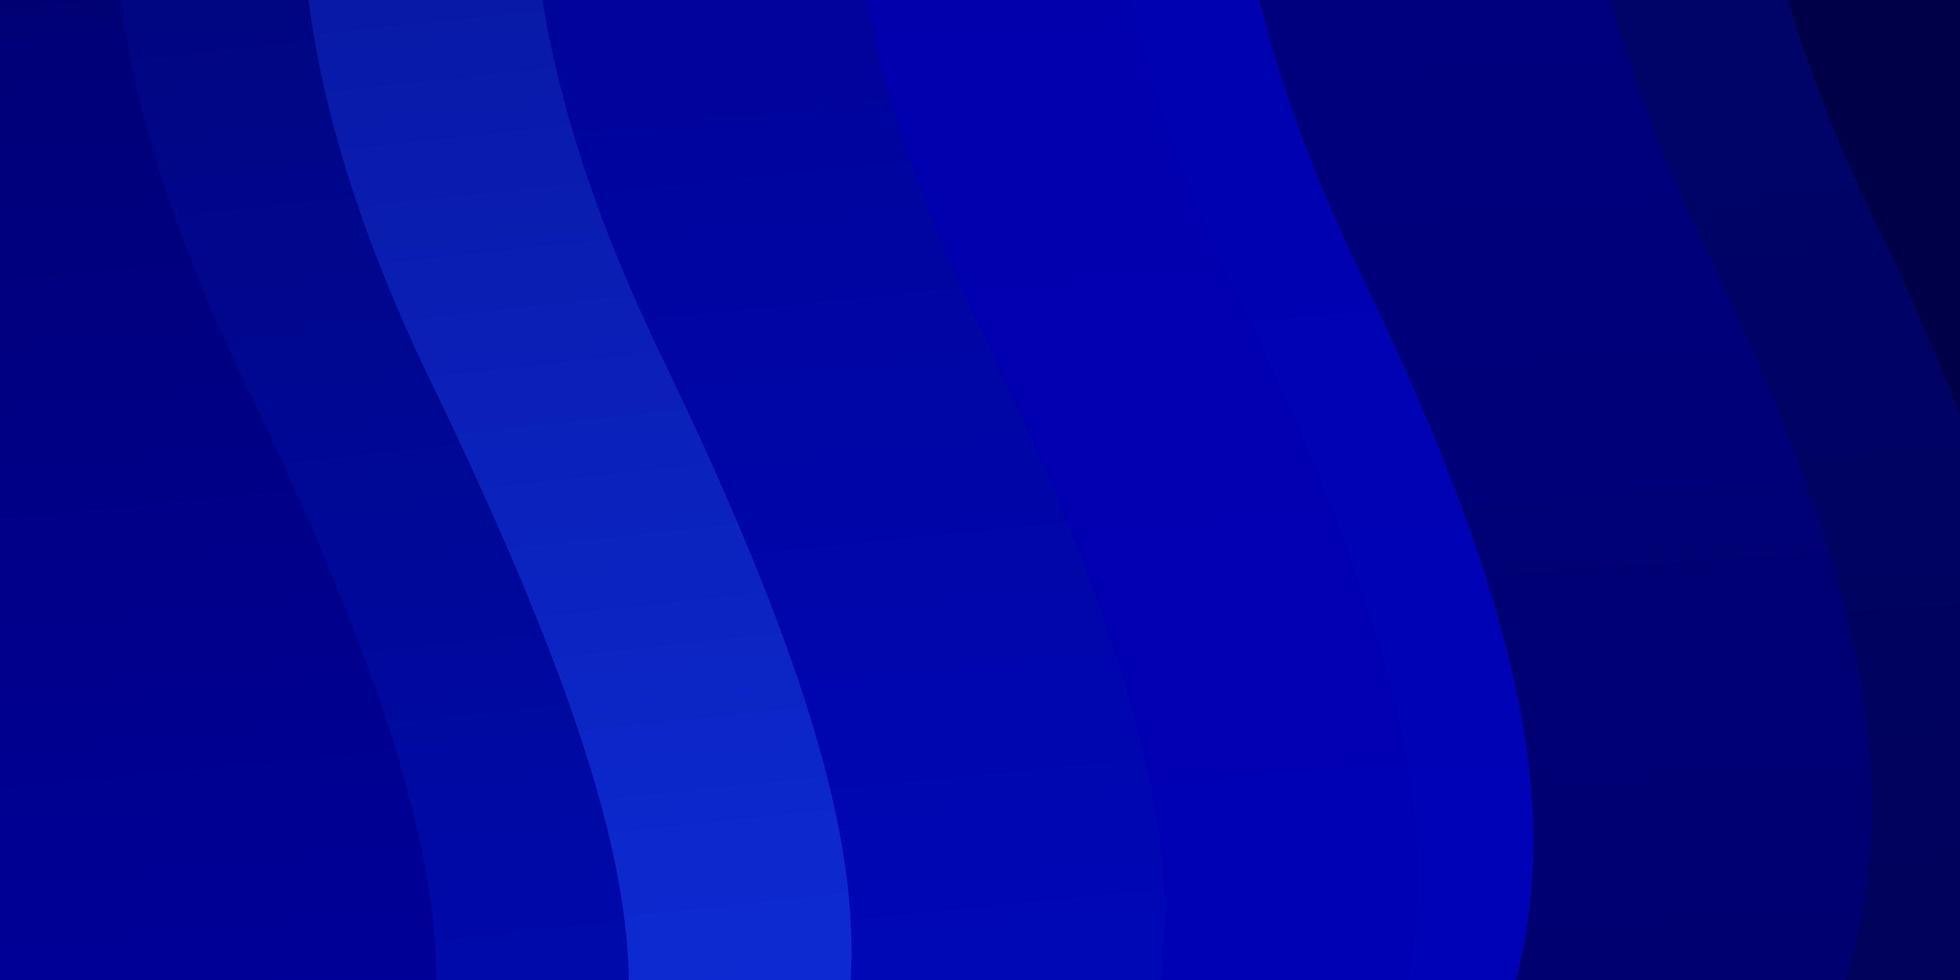 donkerblauwe vectorlay-out met krommen. vector